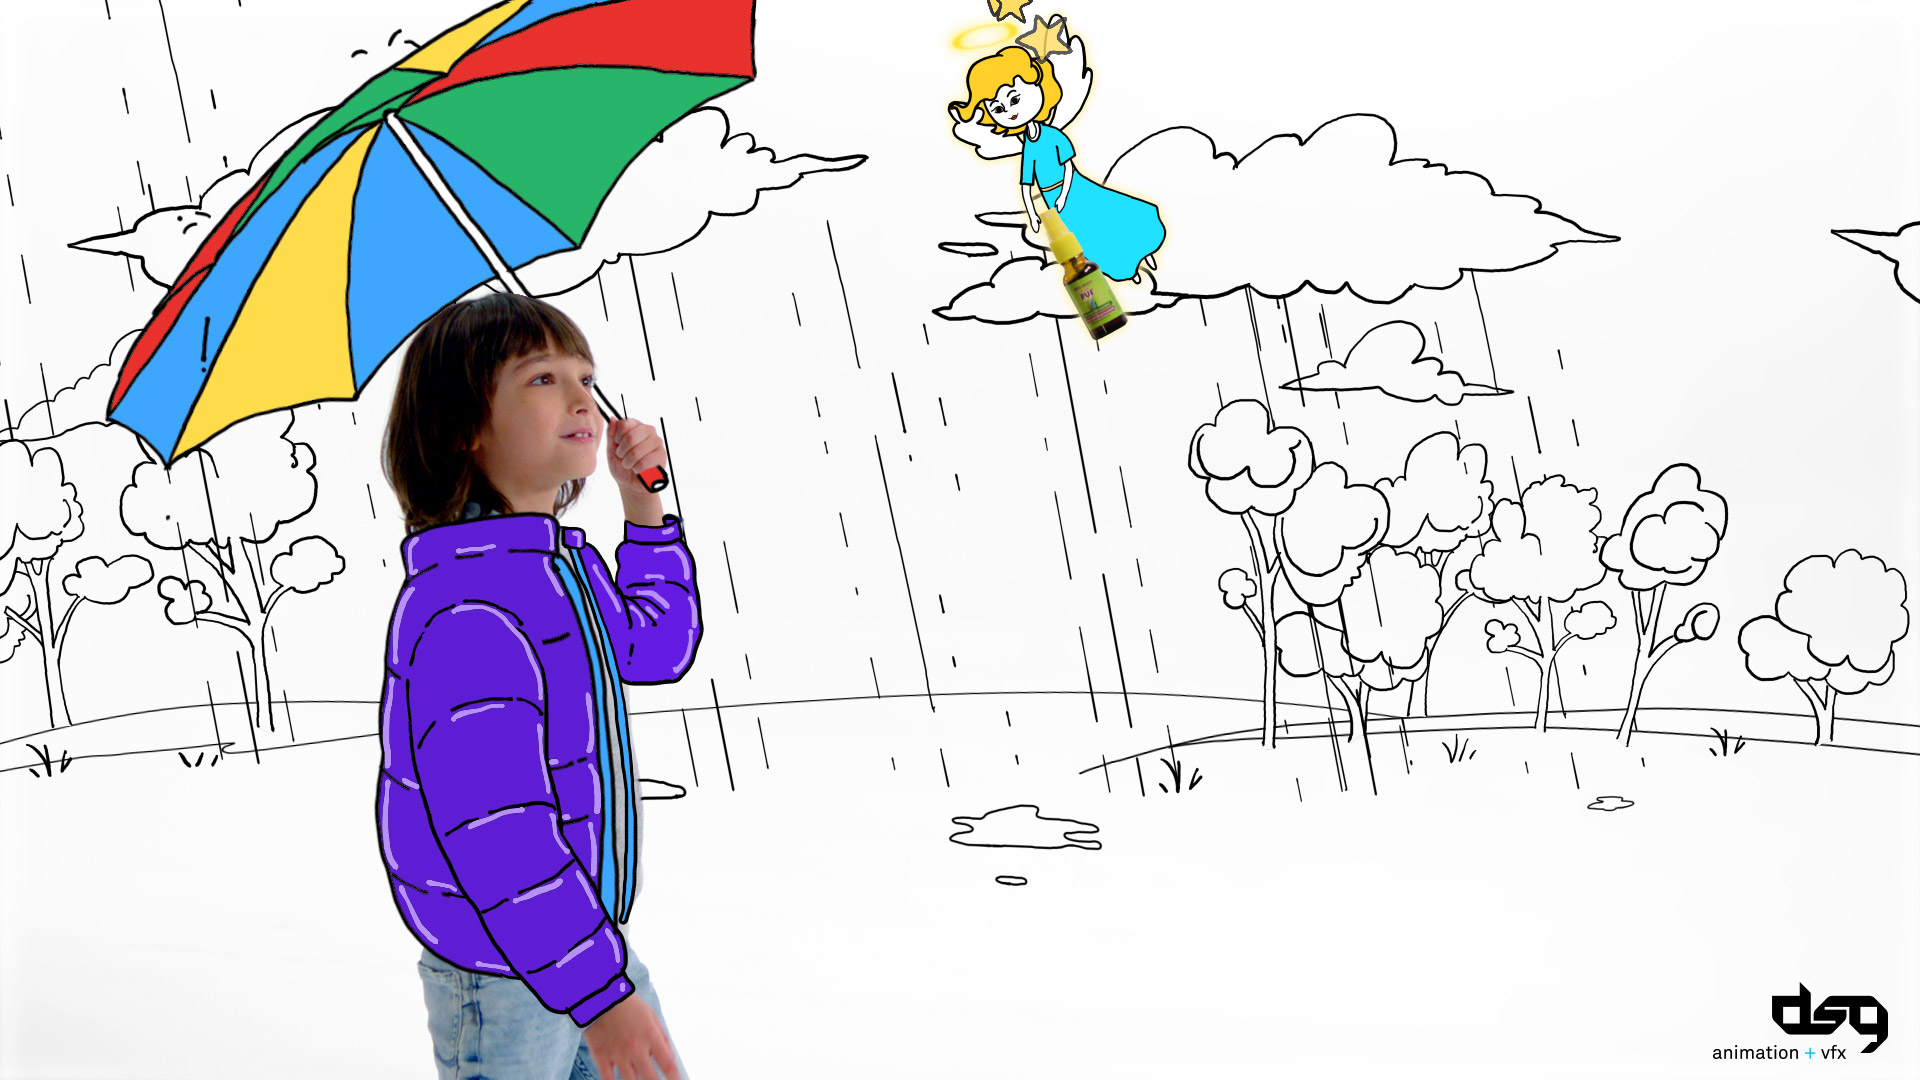 PuffyPuf_Vlad_Pascanu_illustration_3_v01.jpg